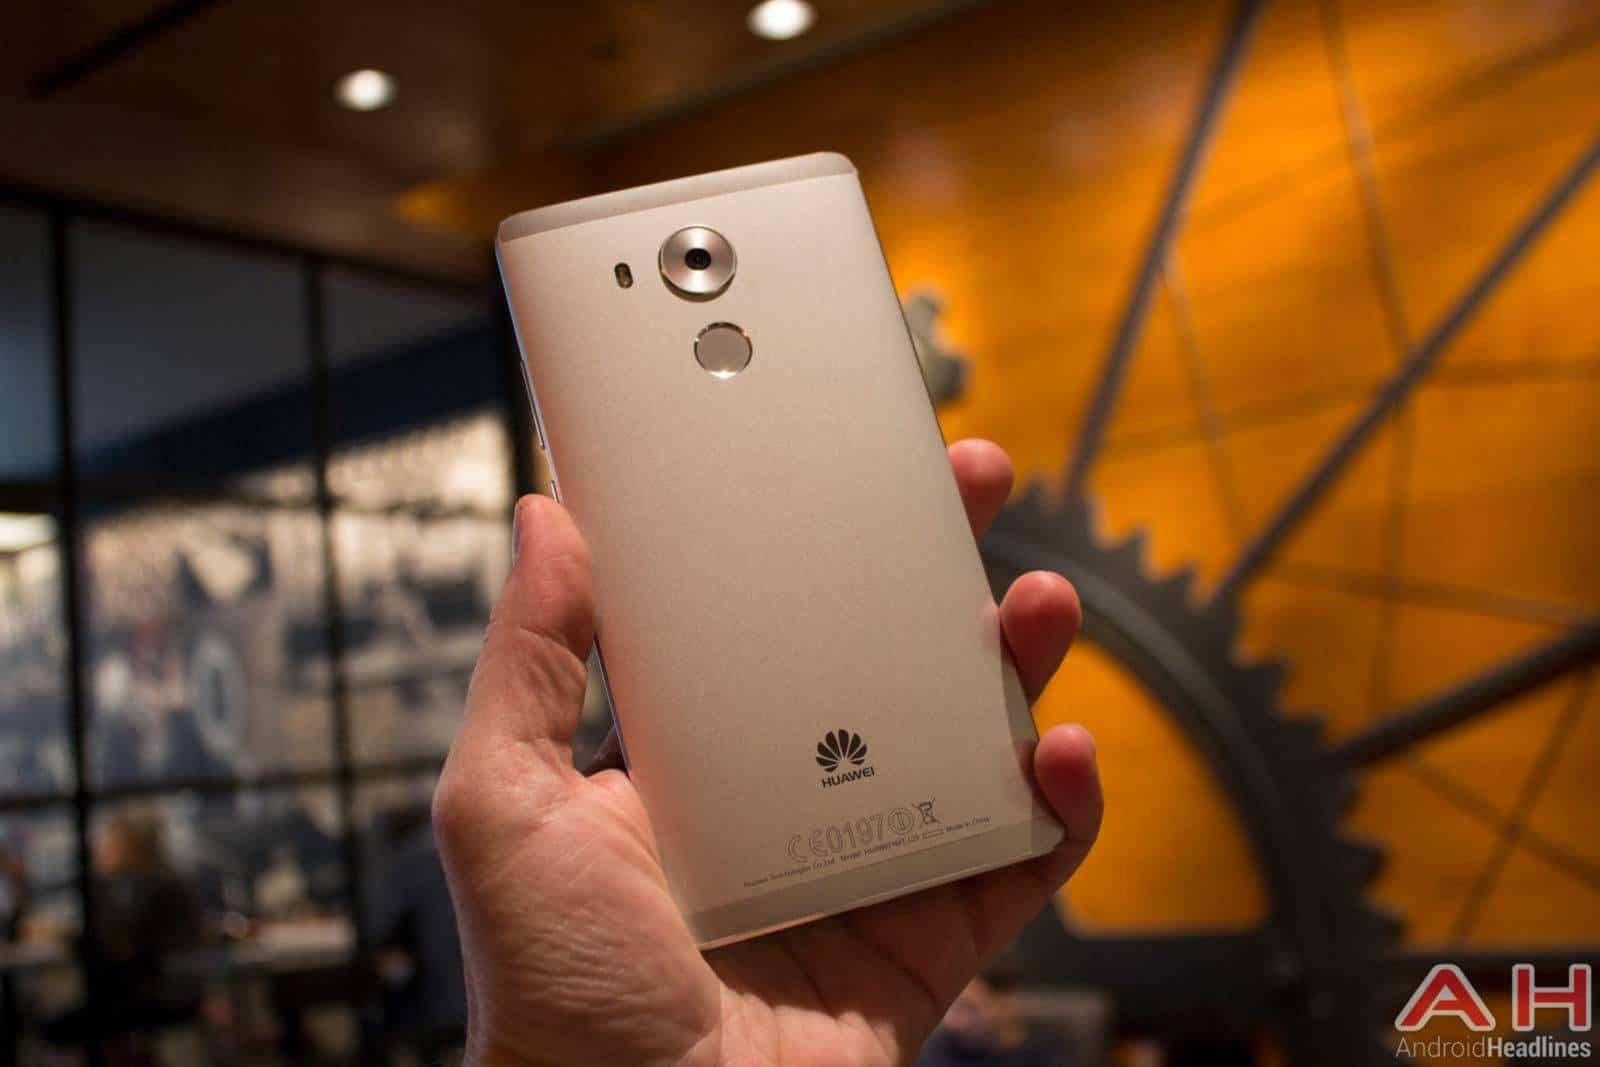 Huawei Mate 8 CES 2016 AH 19